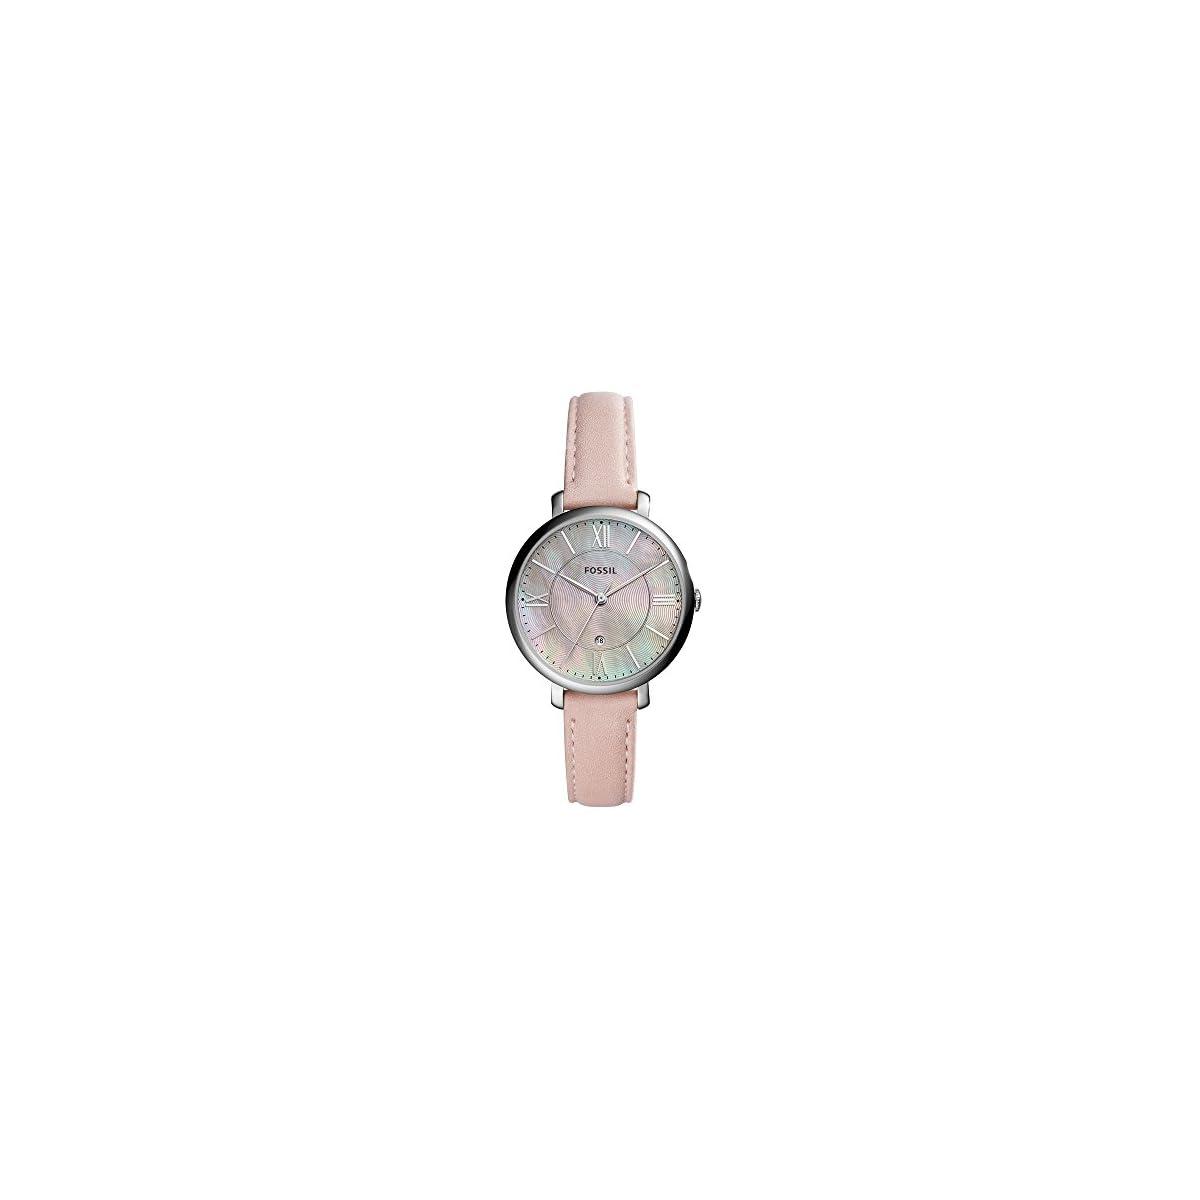 41HTBOhwzAL. SS1200  - Fossil Jacqueline Blush Reloj de cuero para mujer